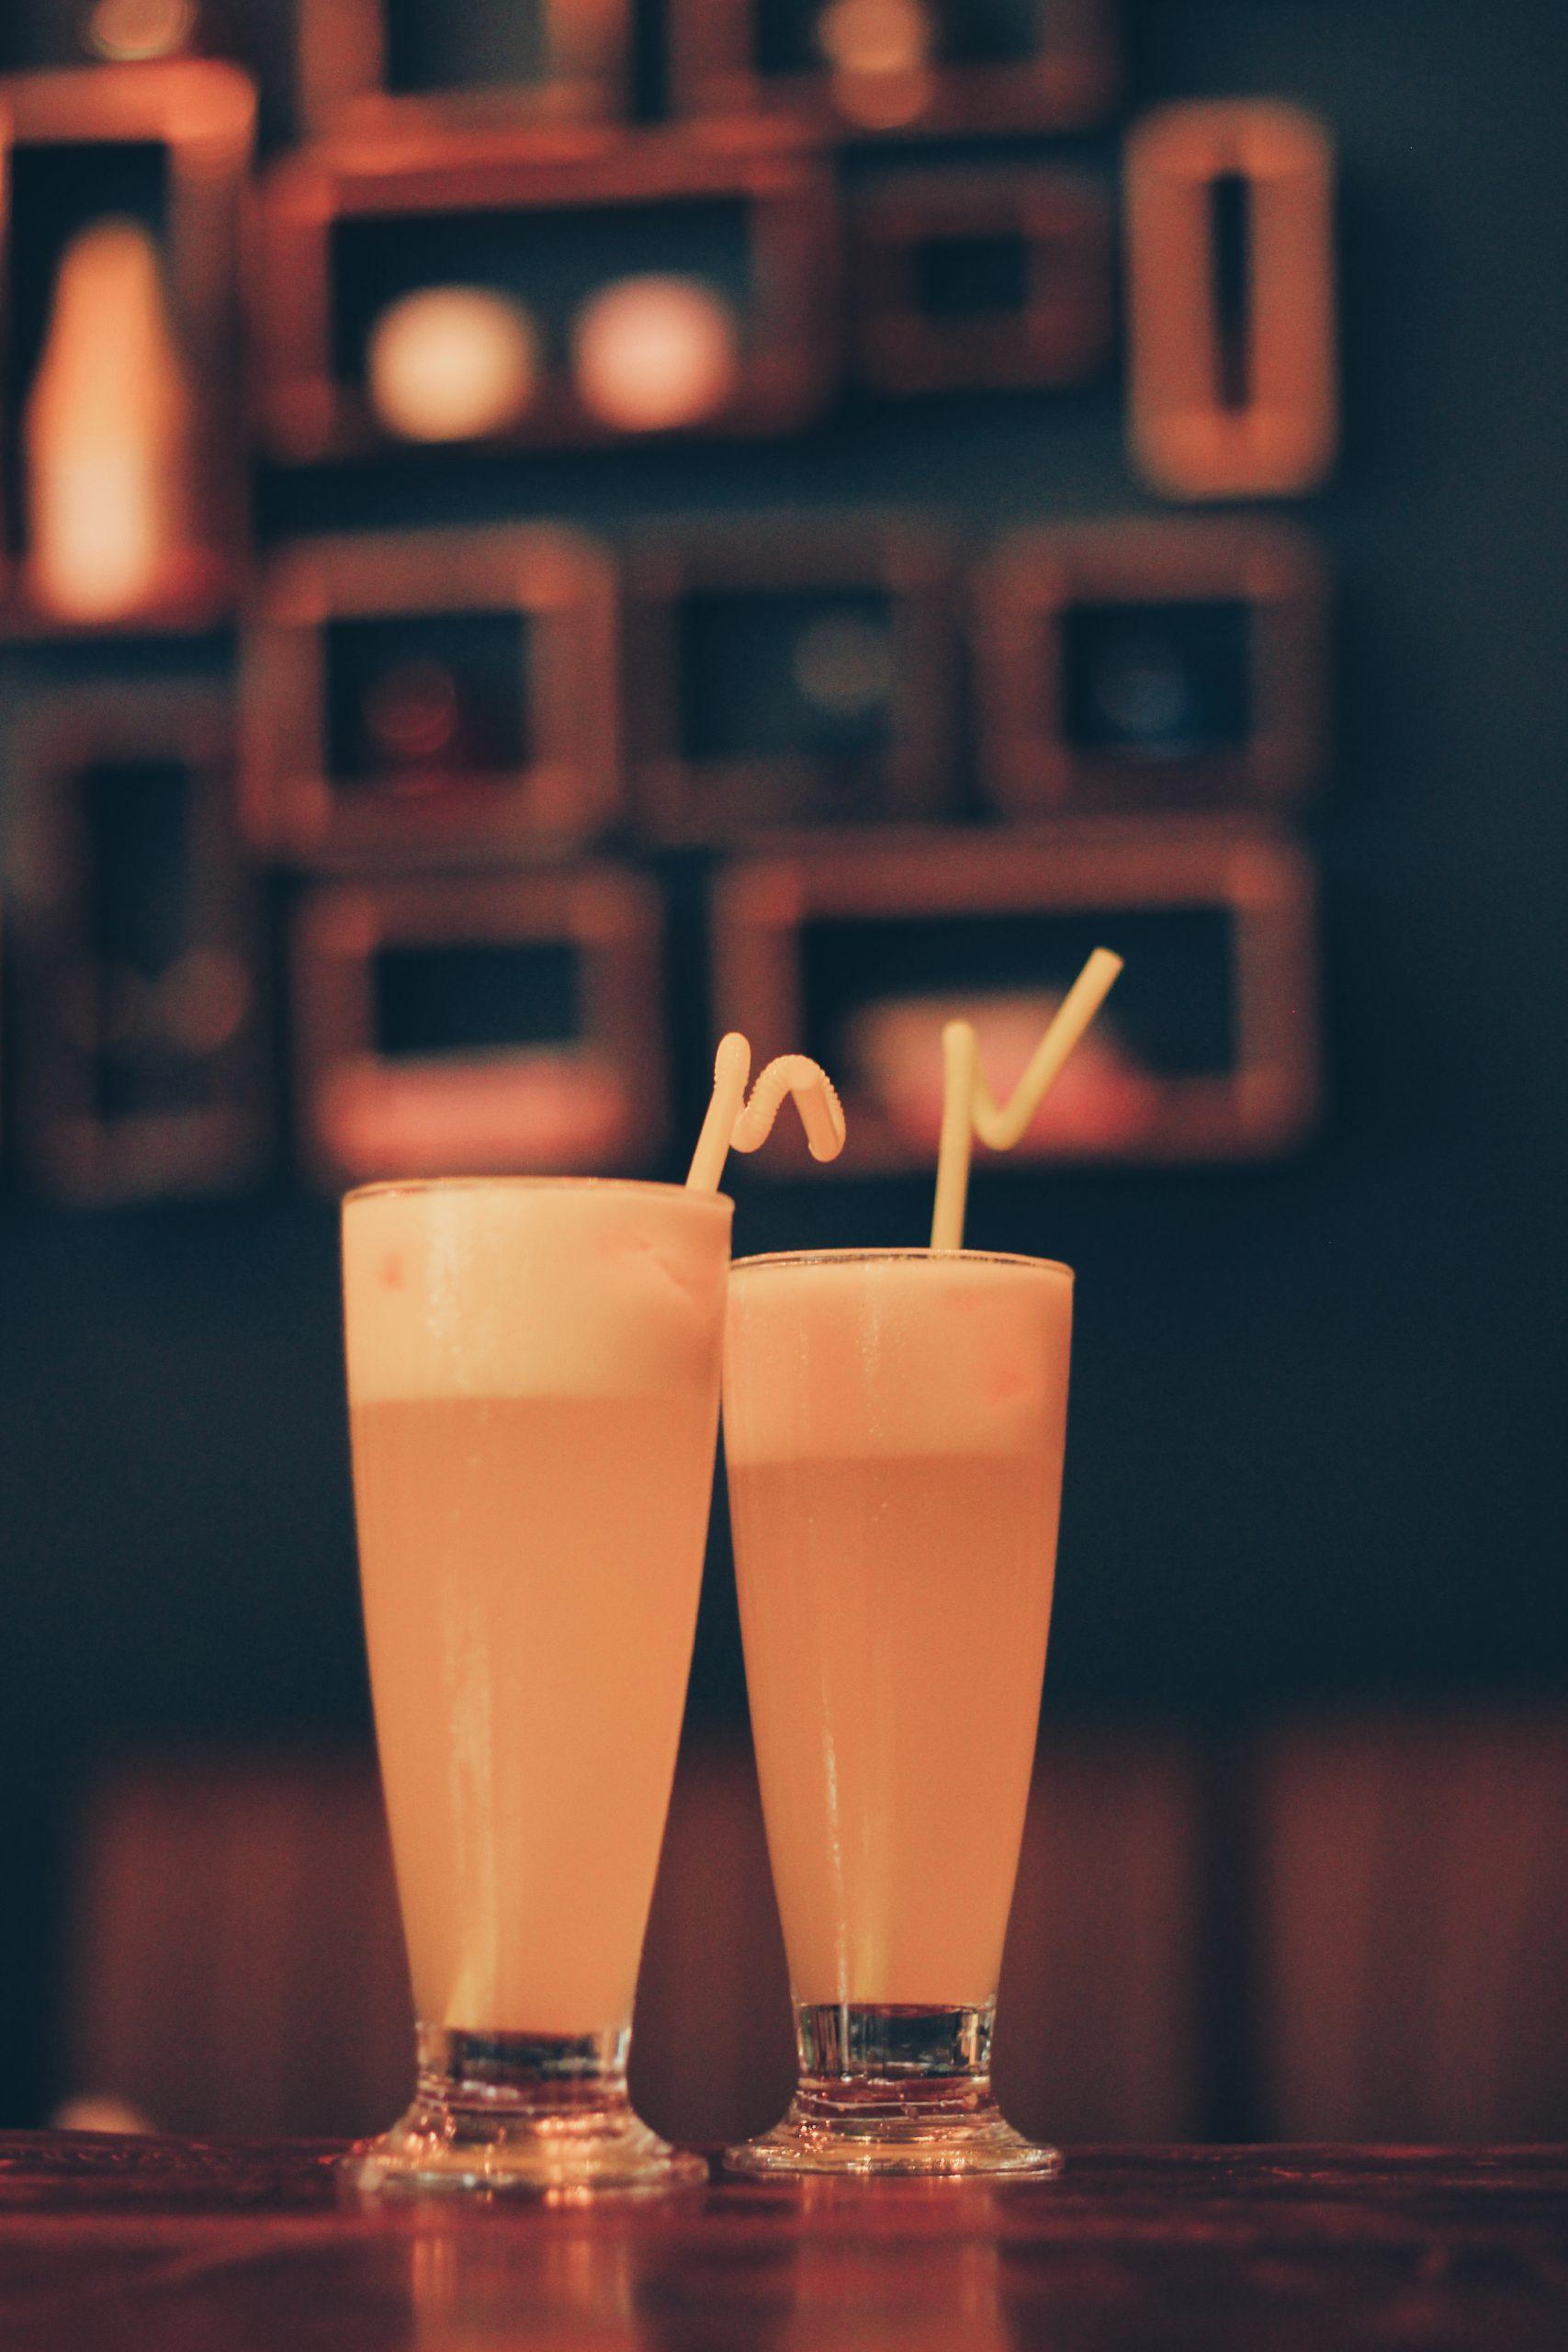 juice served at café